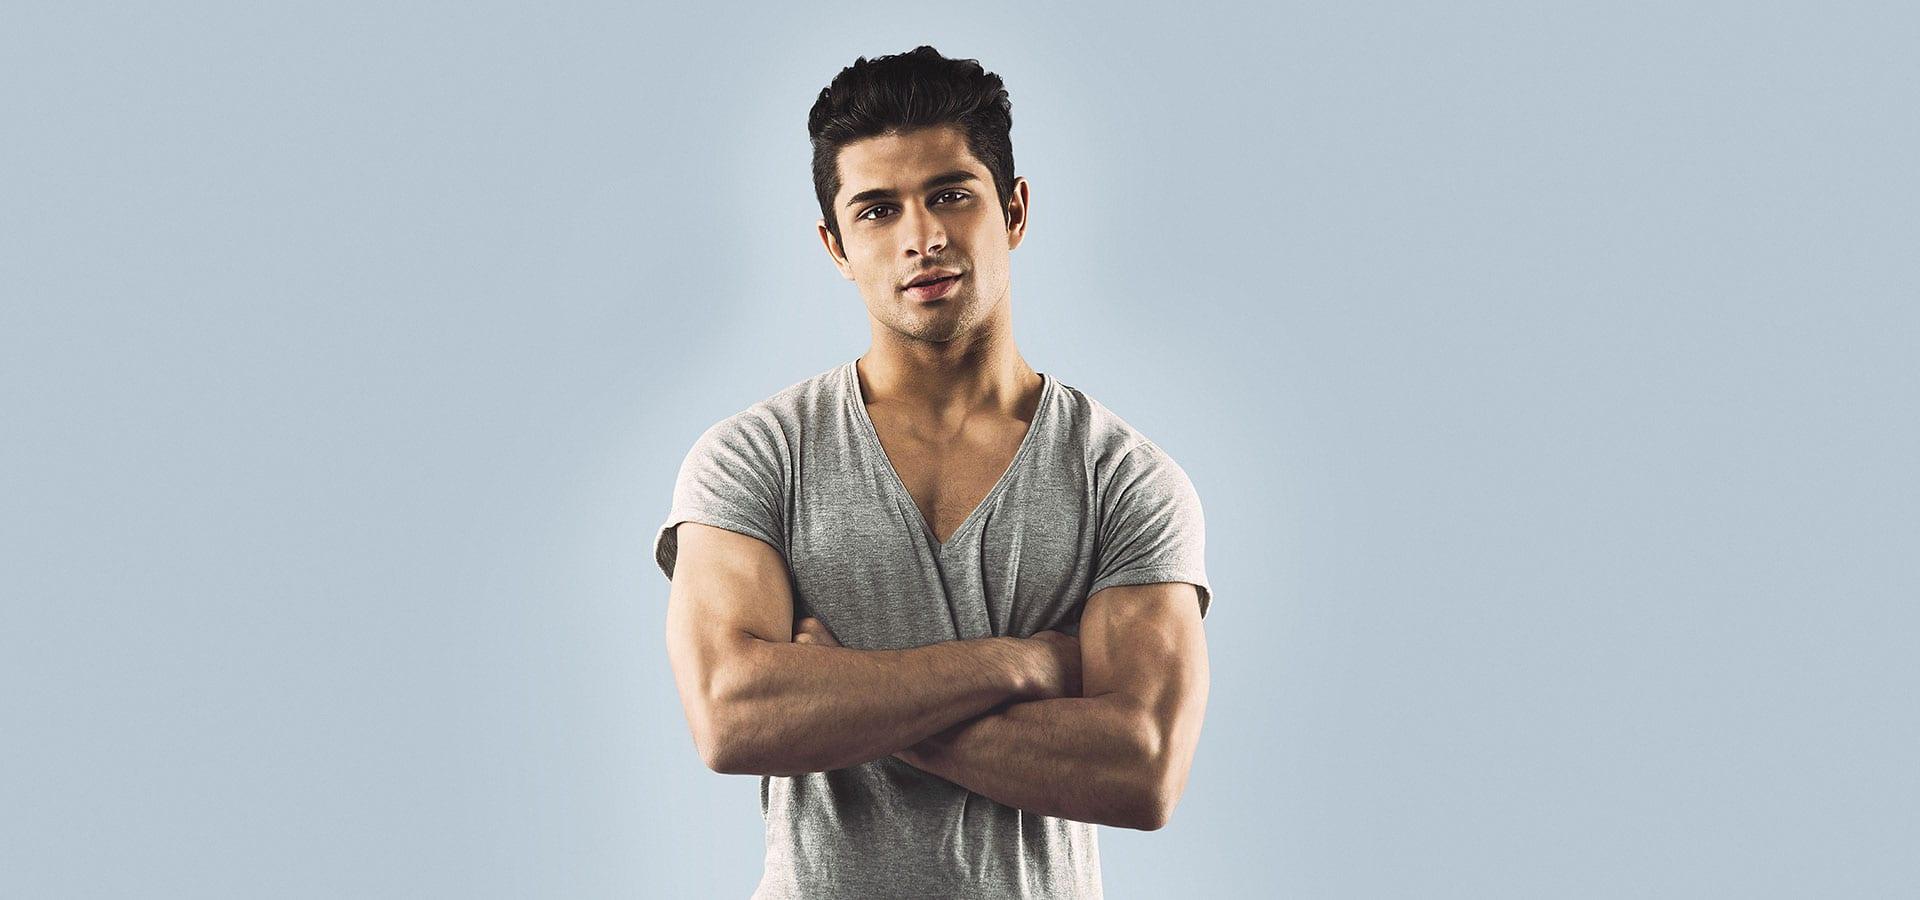 Male model on blue background